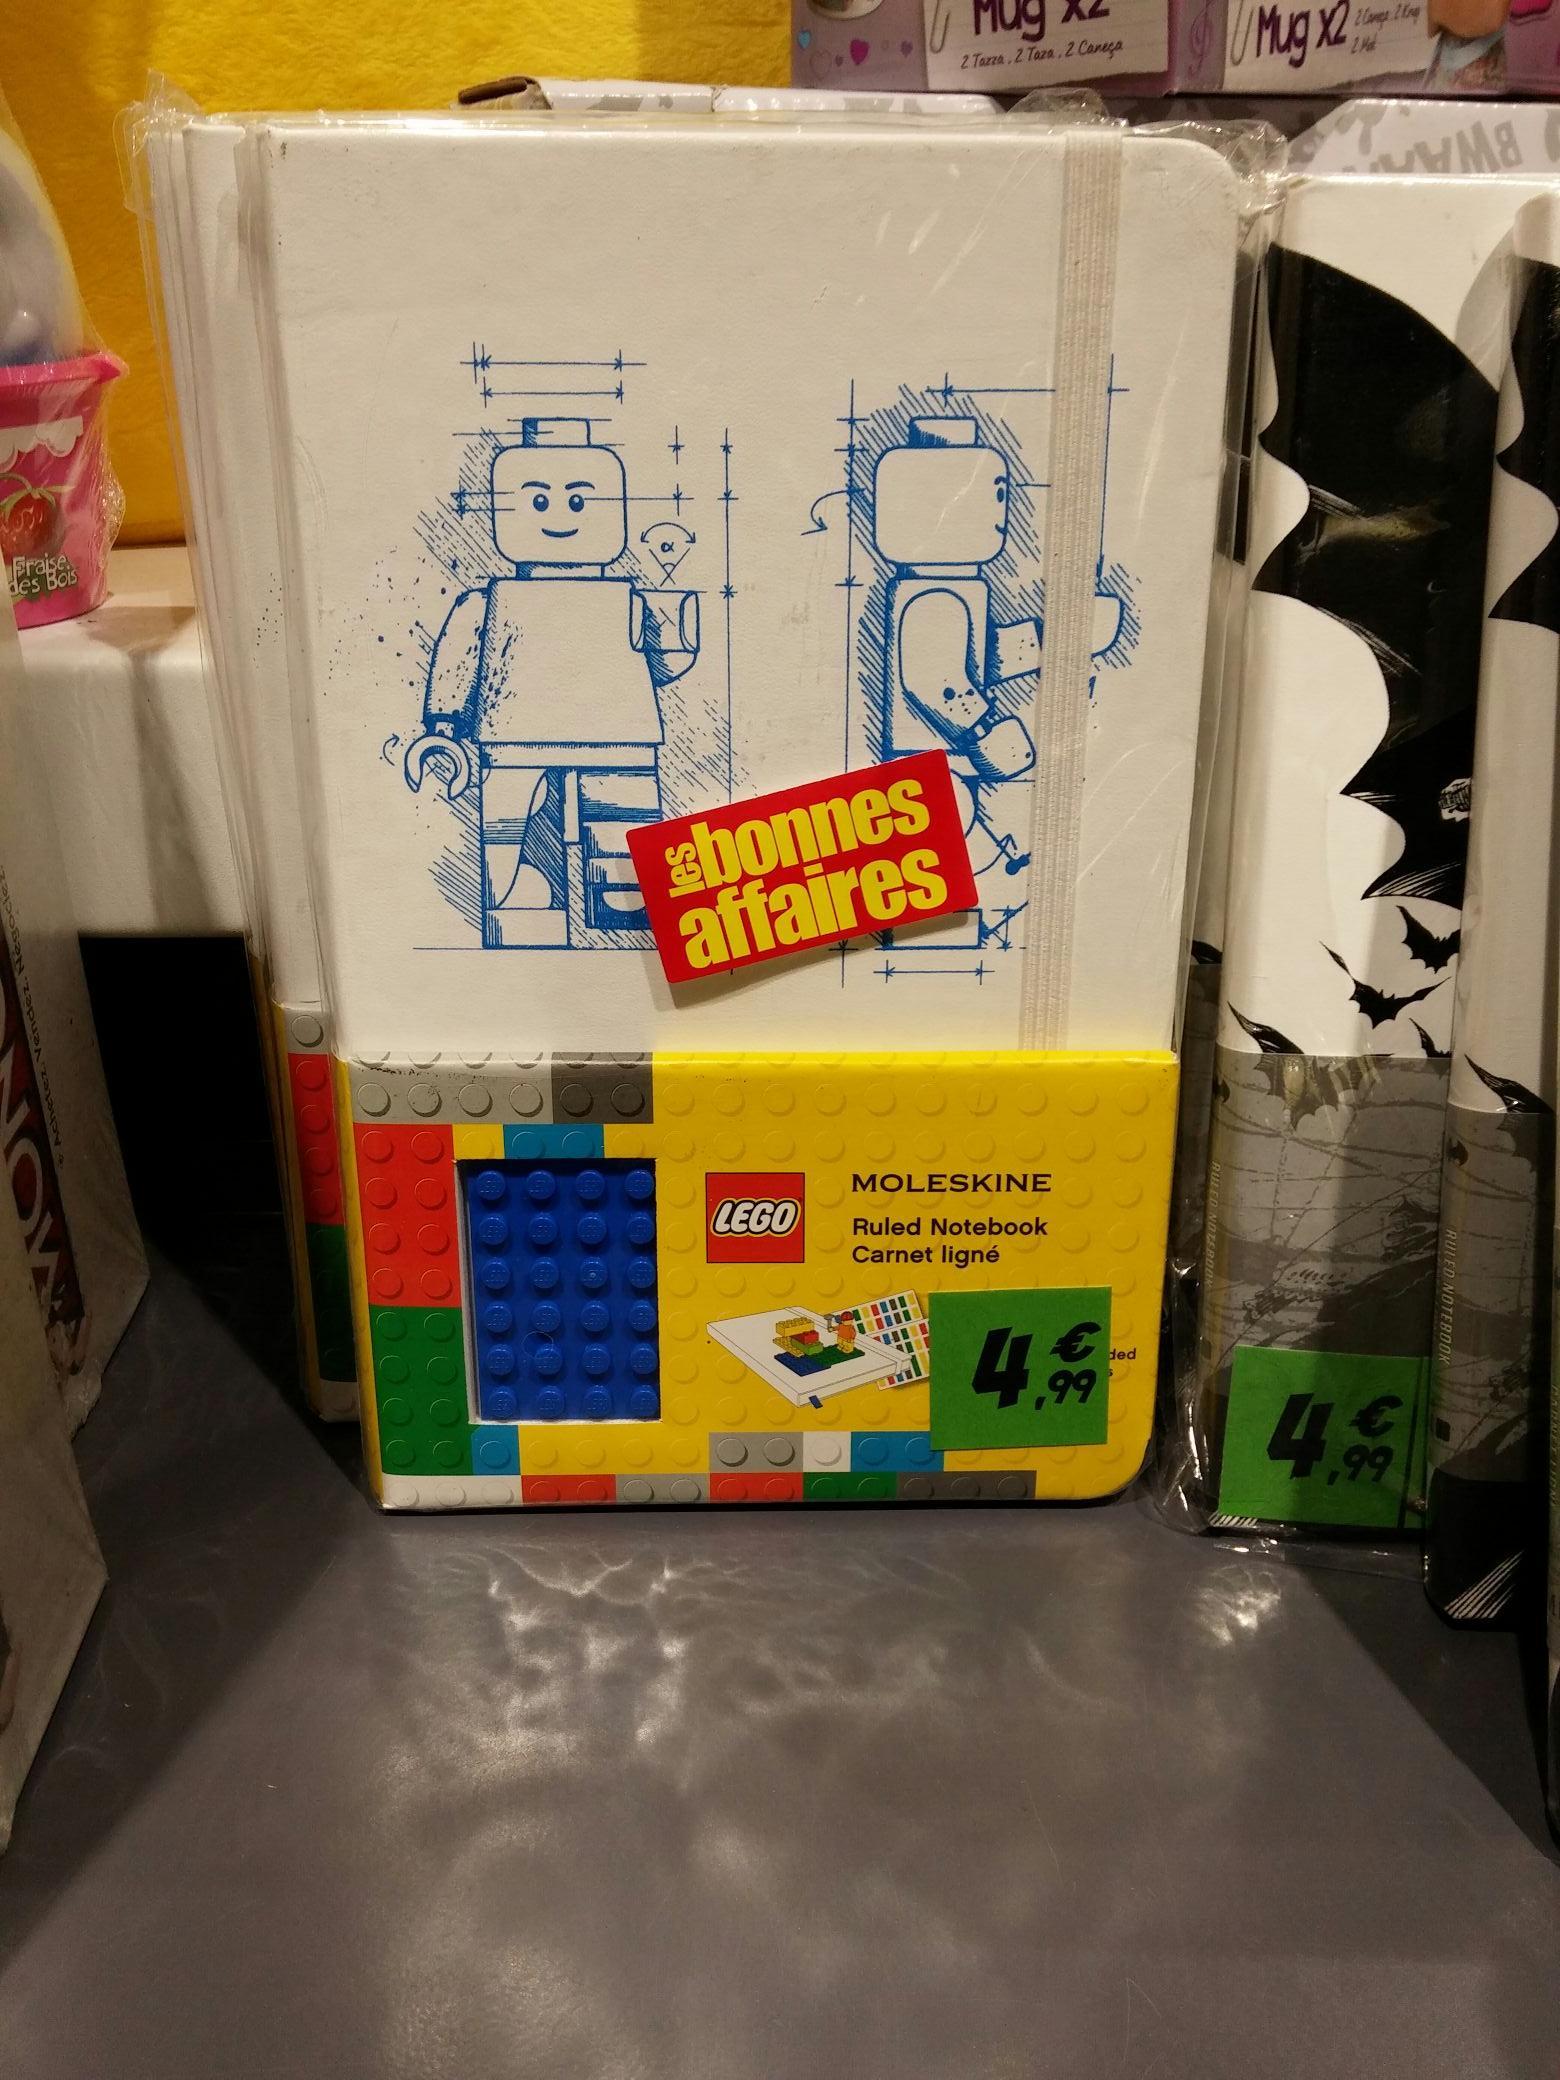 Carnet Lego/Batman Moleskine